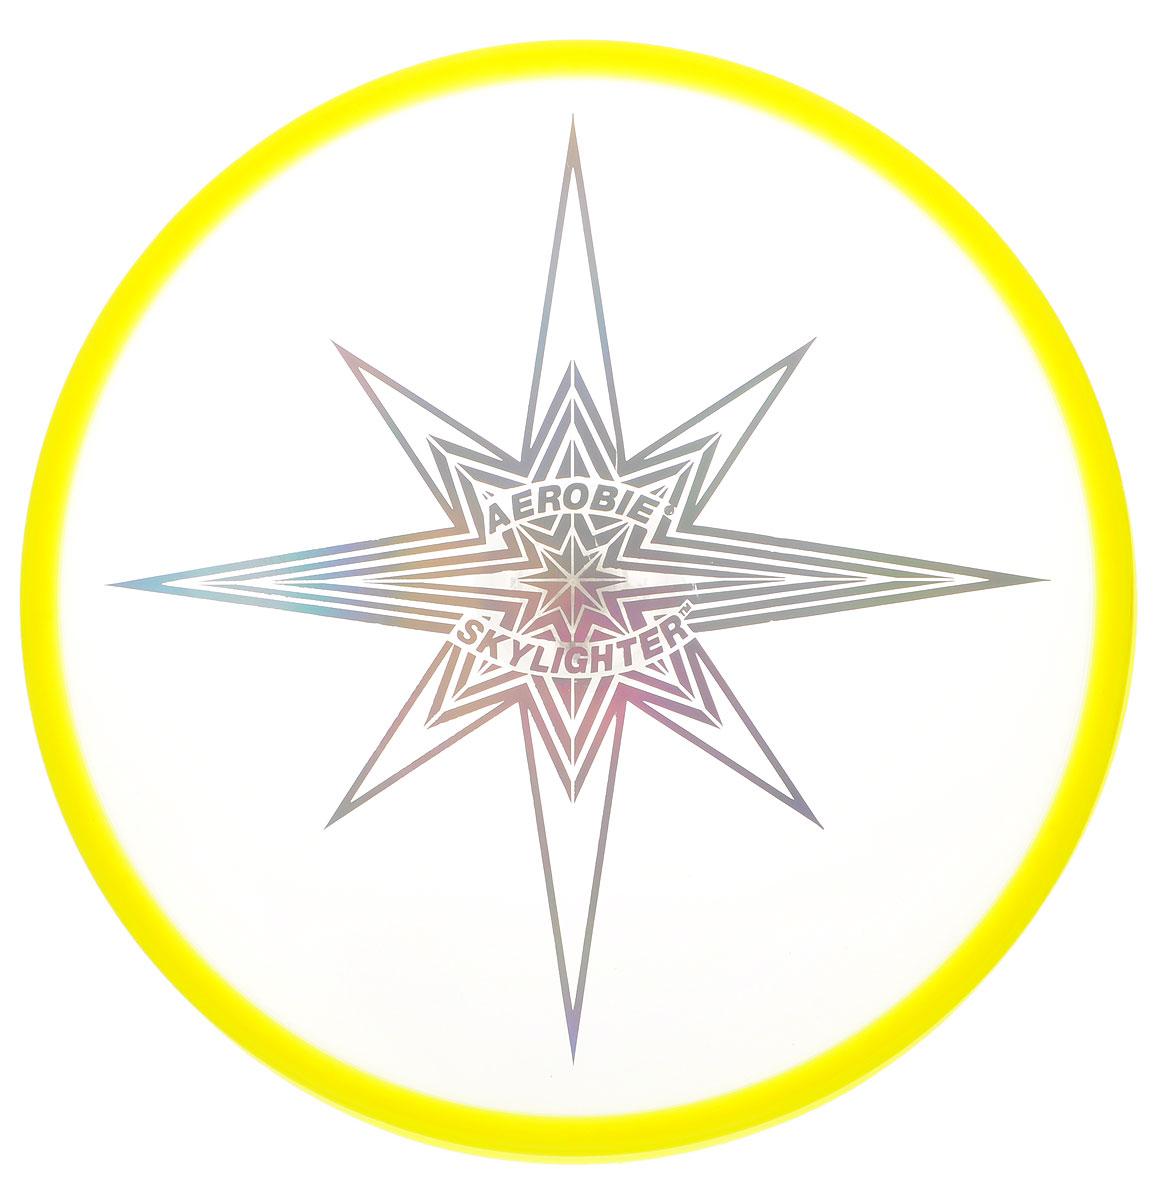 Aerobie Летающий диск Skylighter цвет салатовый